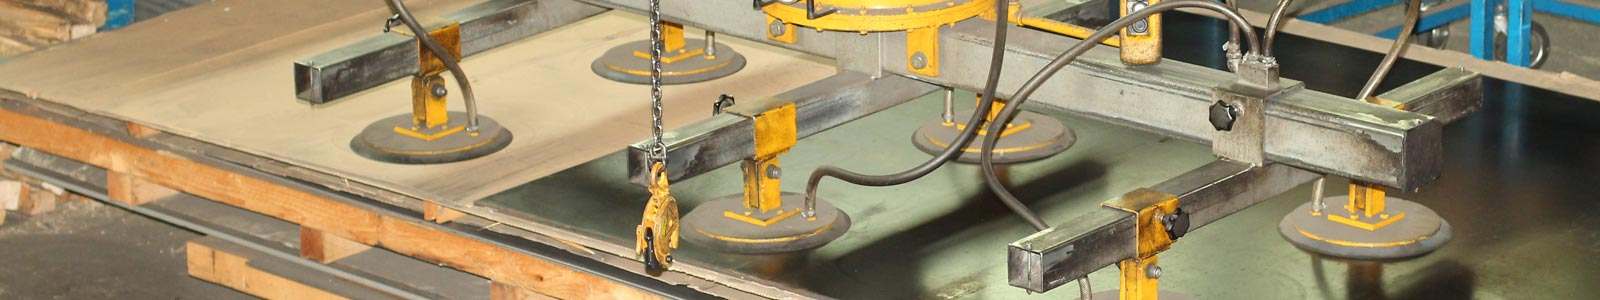 Paul Nitzke GmbH & Co. KG - Paderborn-Elsen